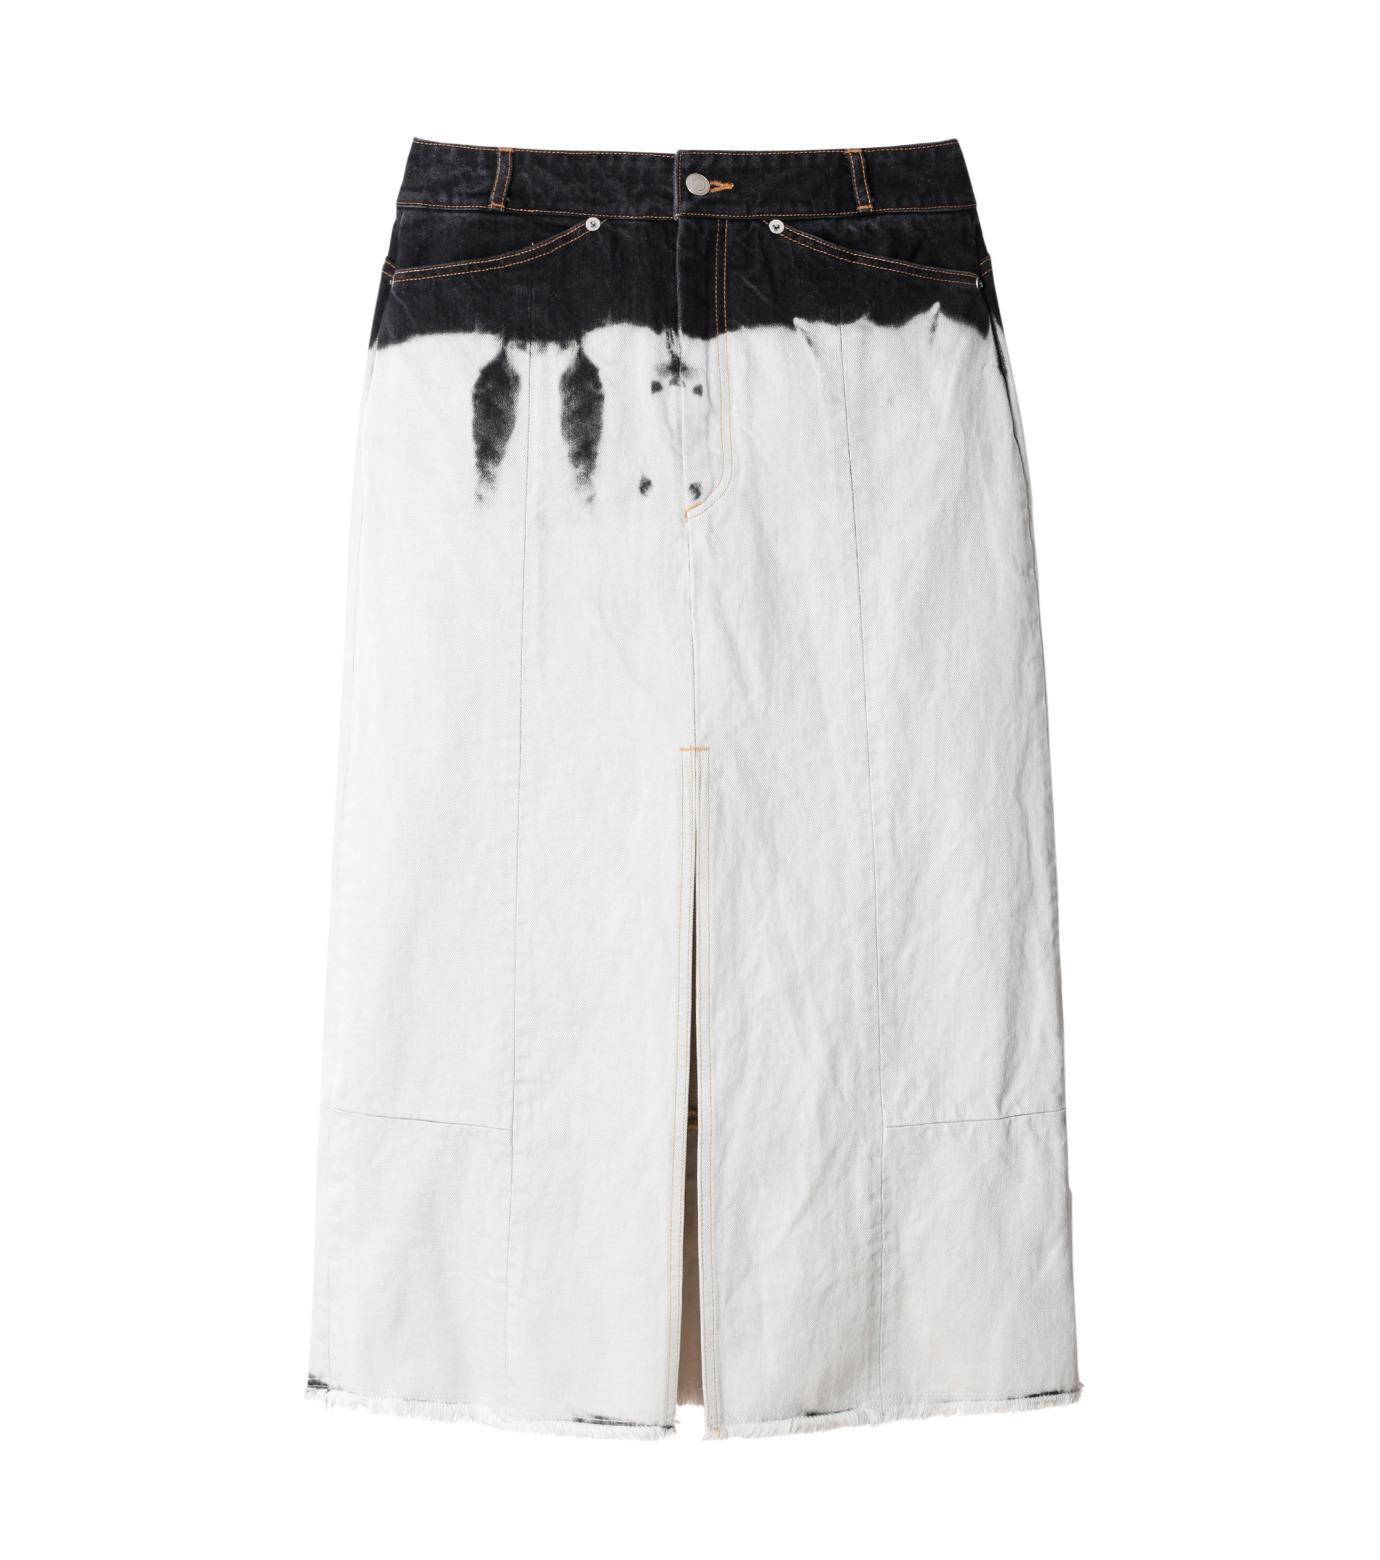 AKANE UTSUNOMIYA(アカネウツノミヤ)のDip Dye Denim Skirt-BLACK(スカート/skirt)-W16FSK383002-13 拡大詳細画像1